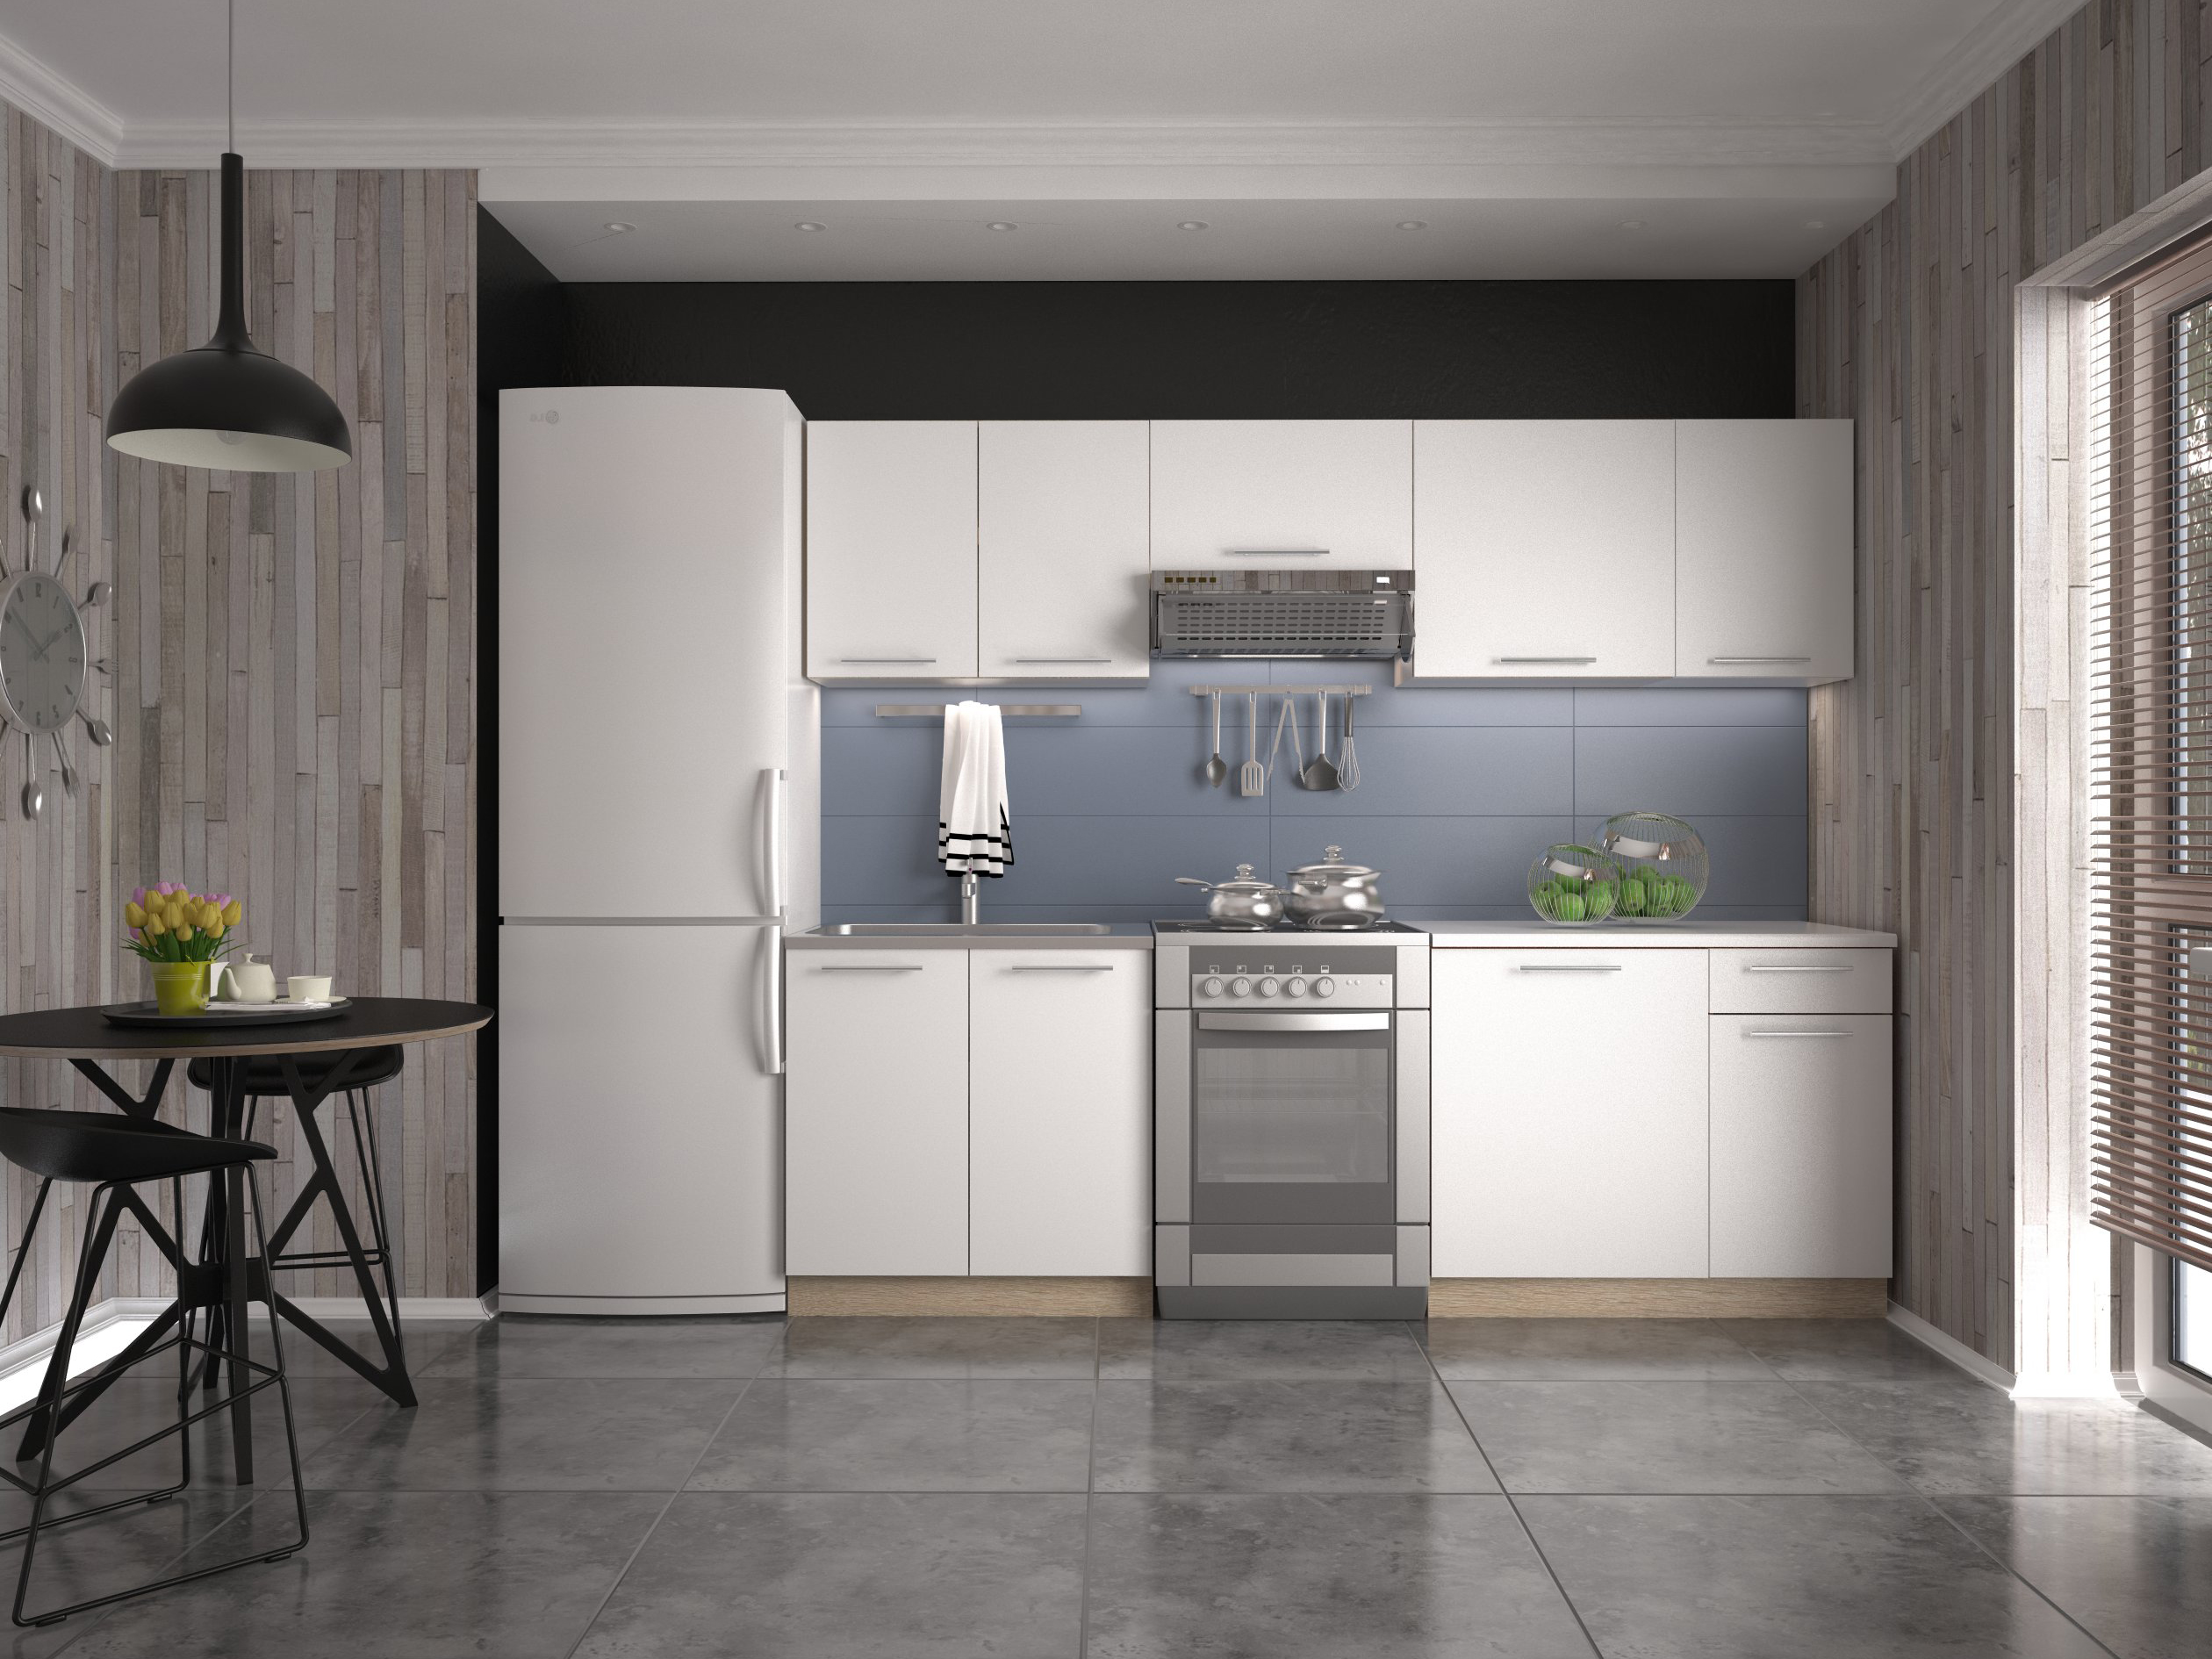 Kuchyňa Daria 240 cm  NovýNábytok sk -> Leroy Merlin Kuchnia Fiona Biala